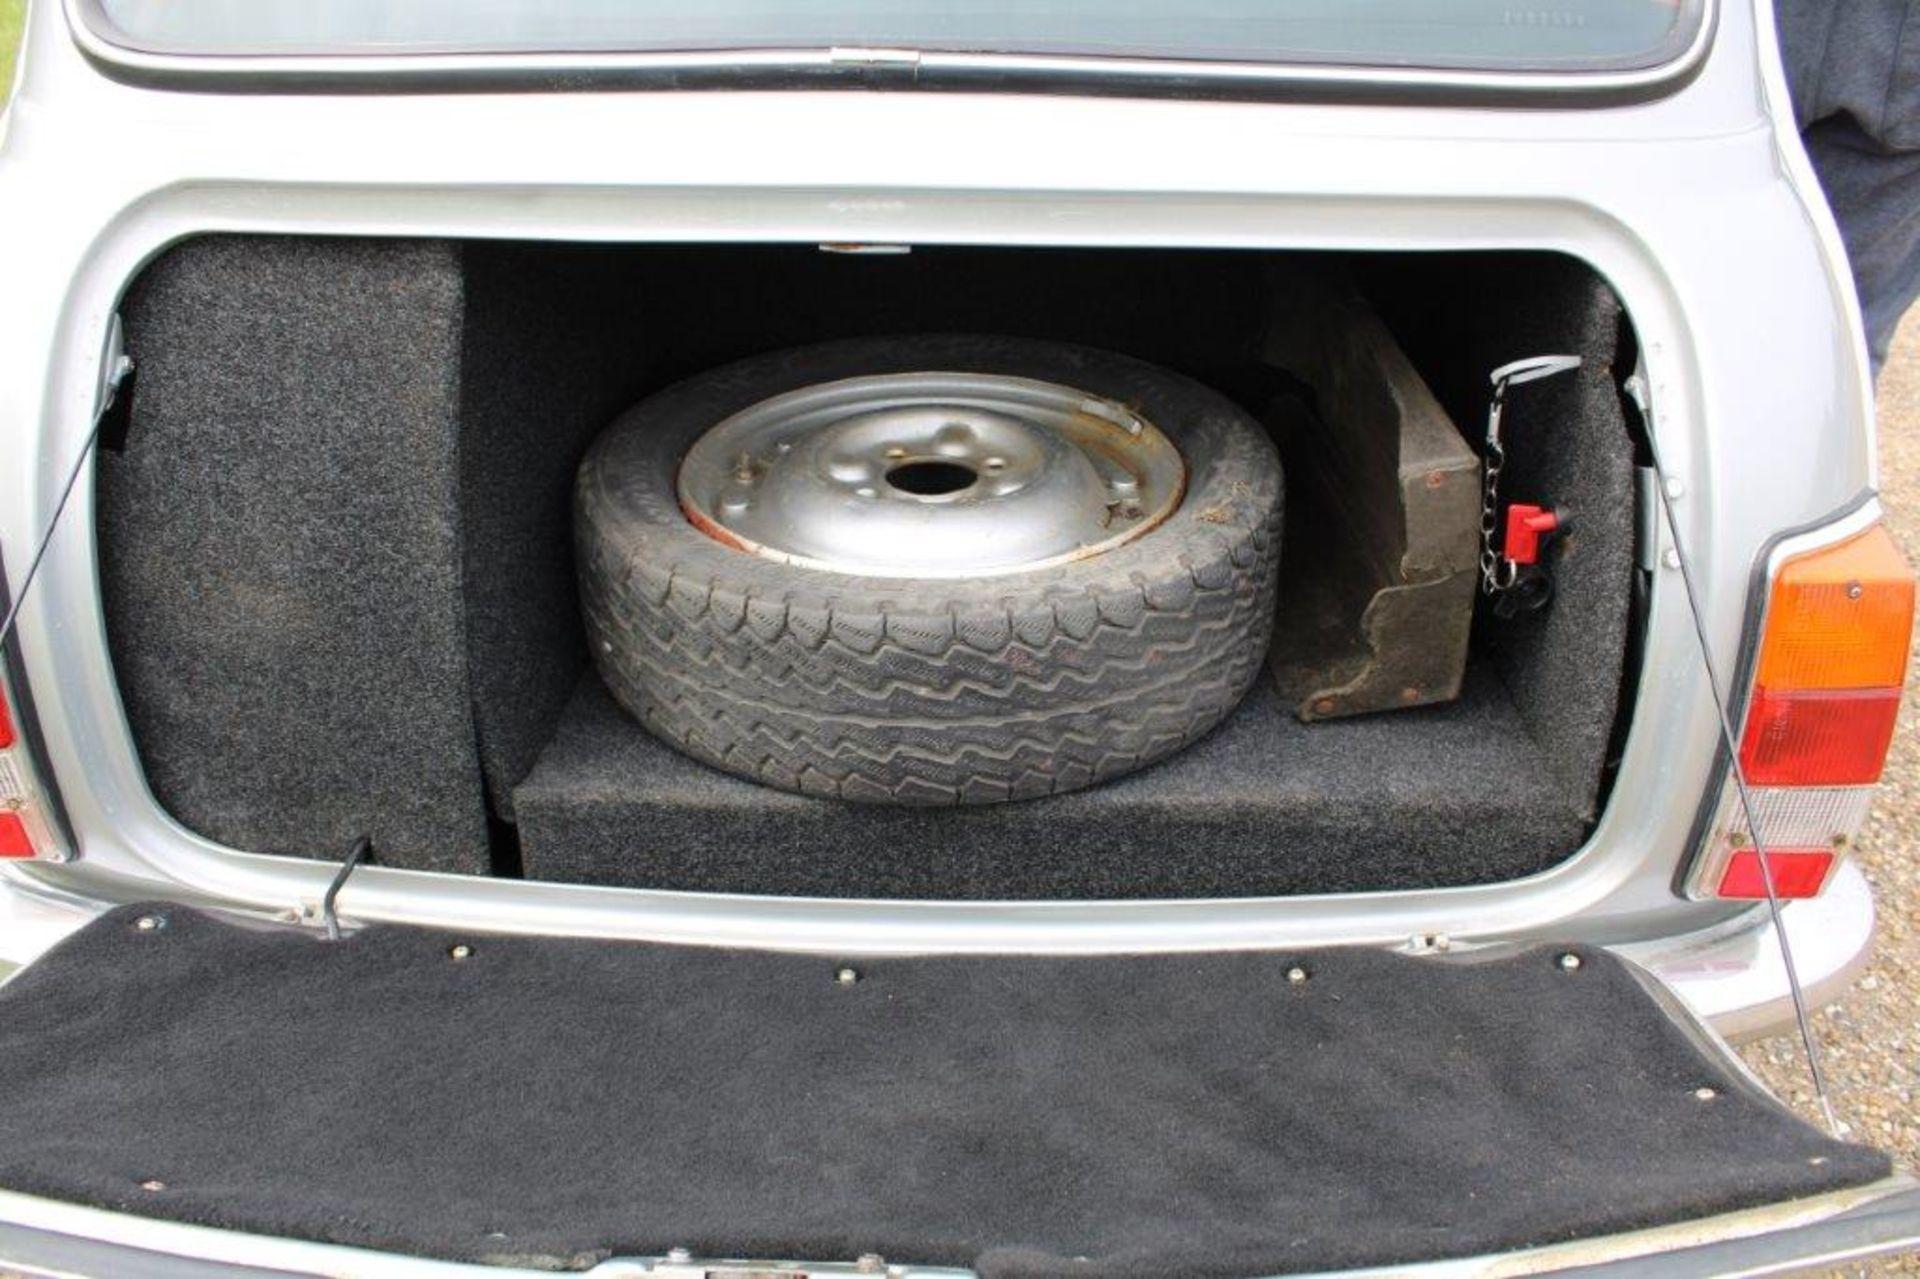 1980 Austin Morris Mini 1275 GT - Image 19 of 28